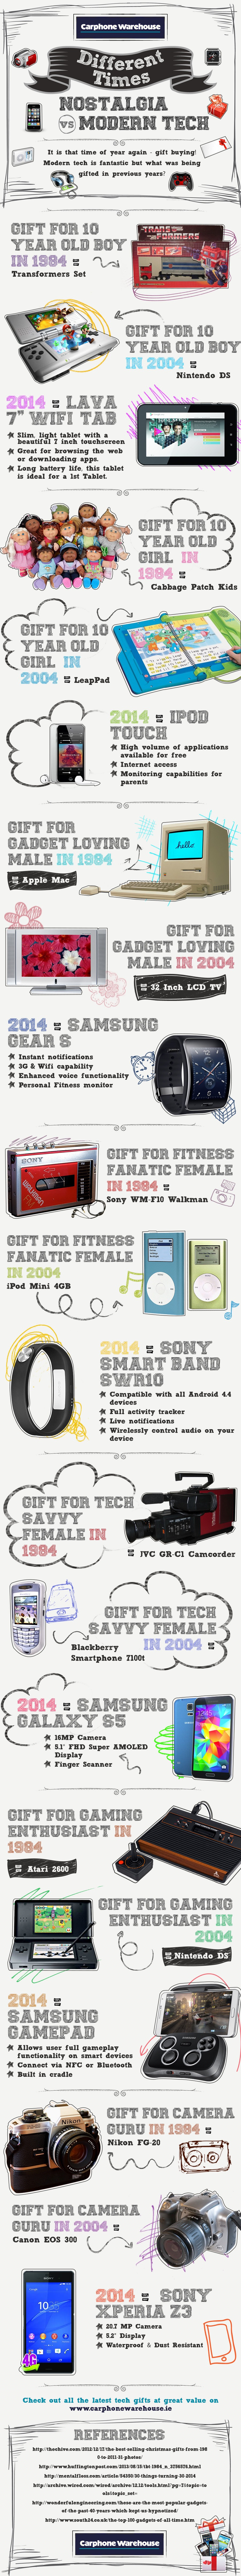 Christmas gadgets evolution 1984, 2004, 2014